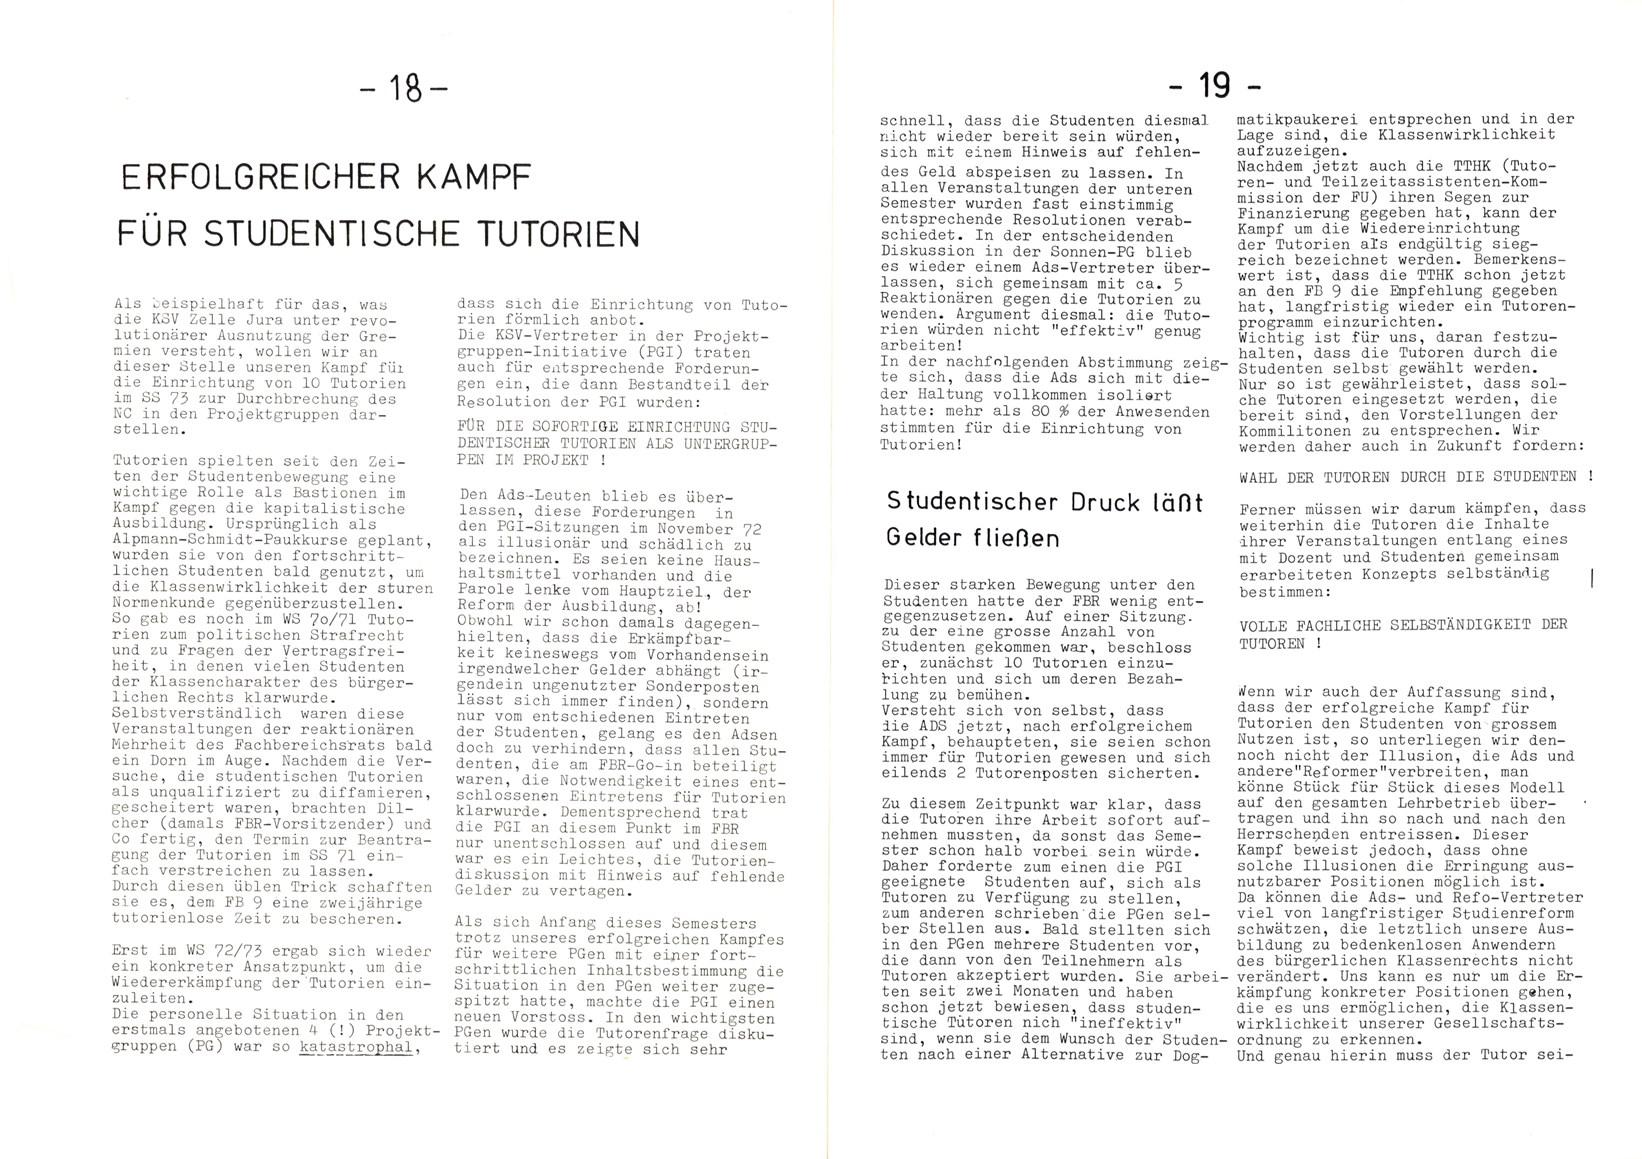 Berlin_KSV_Jura_Studentenpresse_19730600_20_10